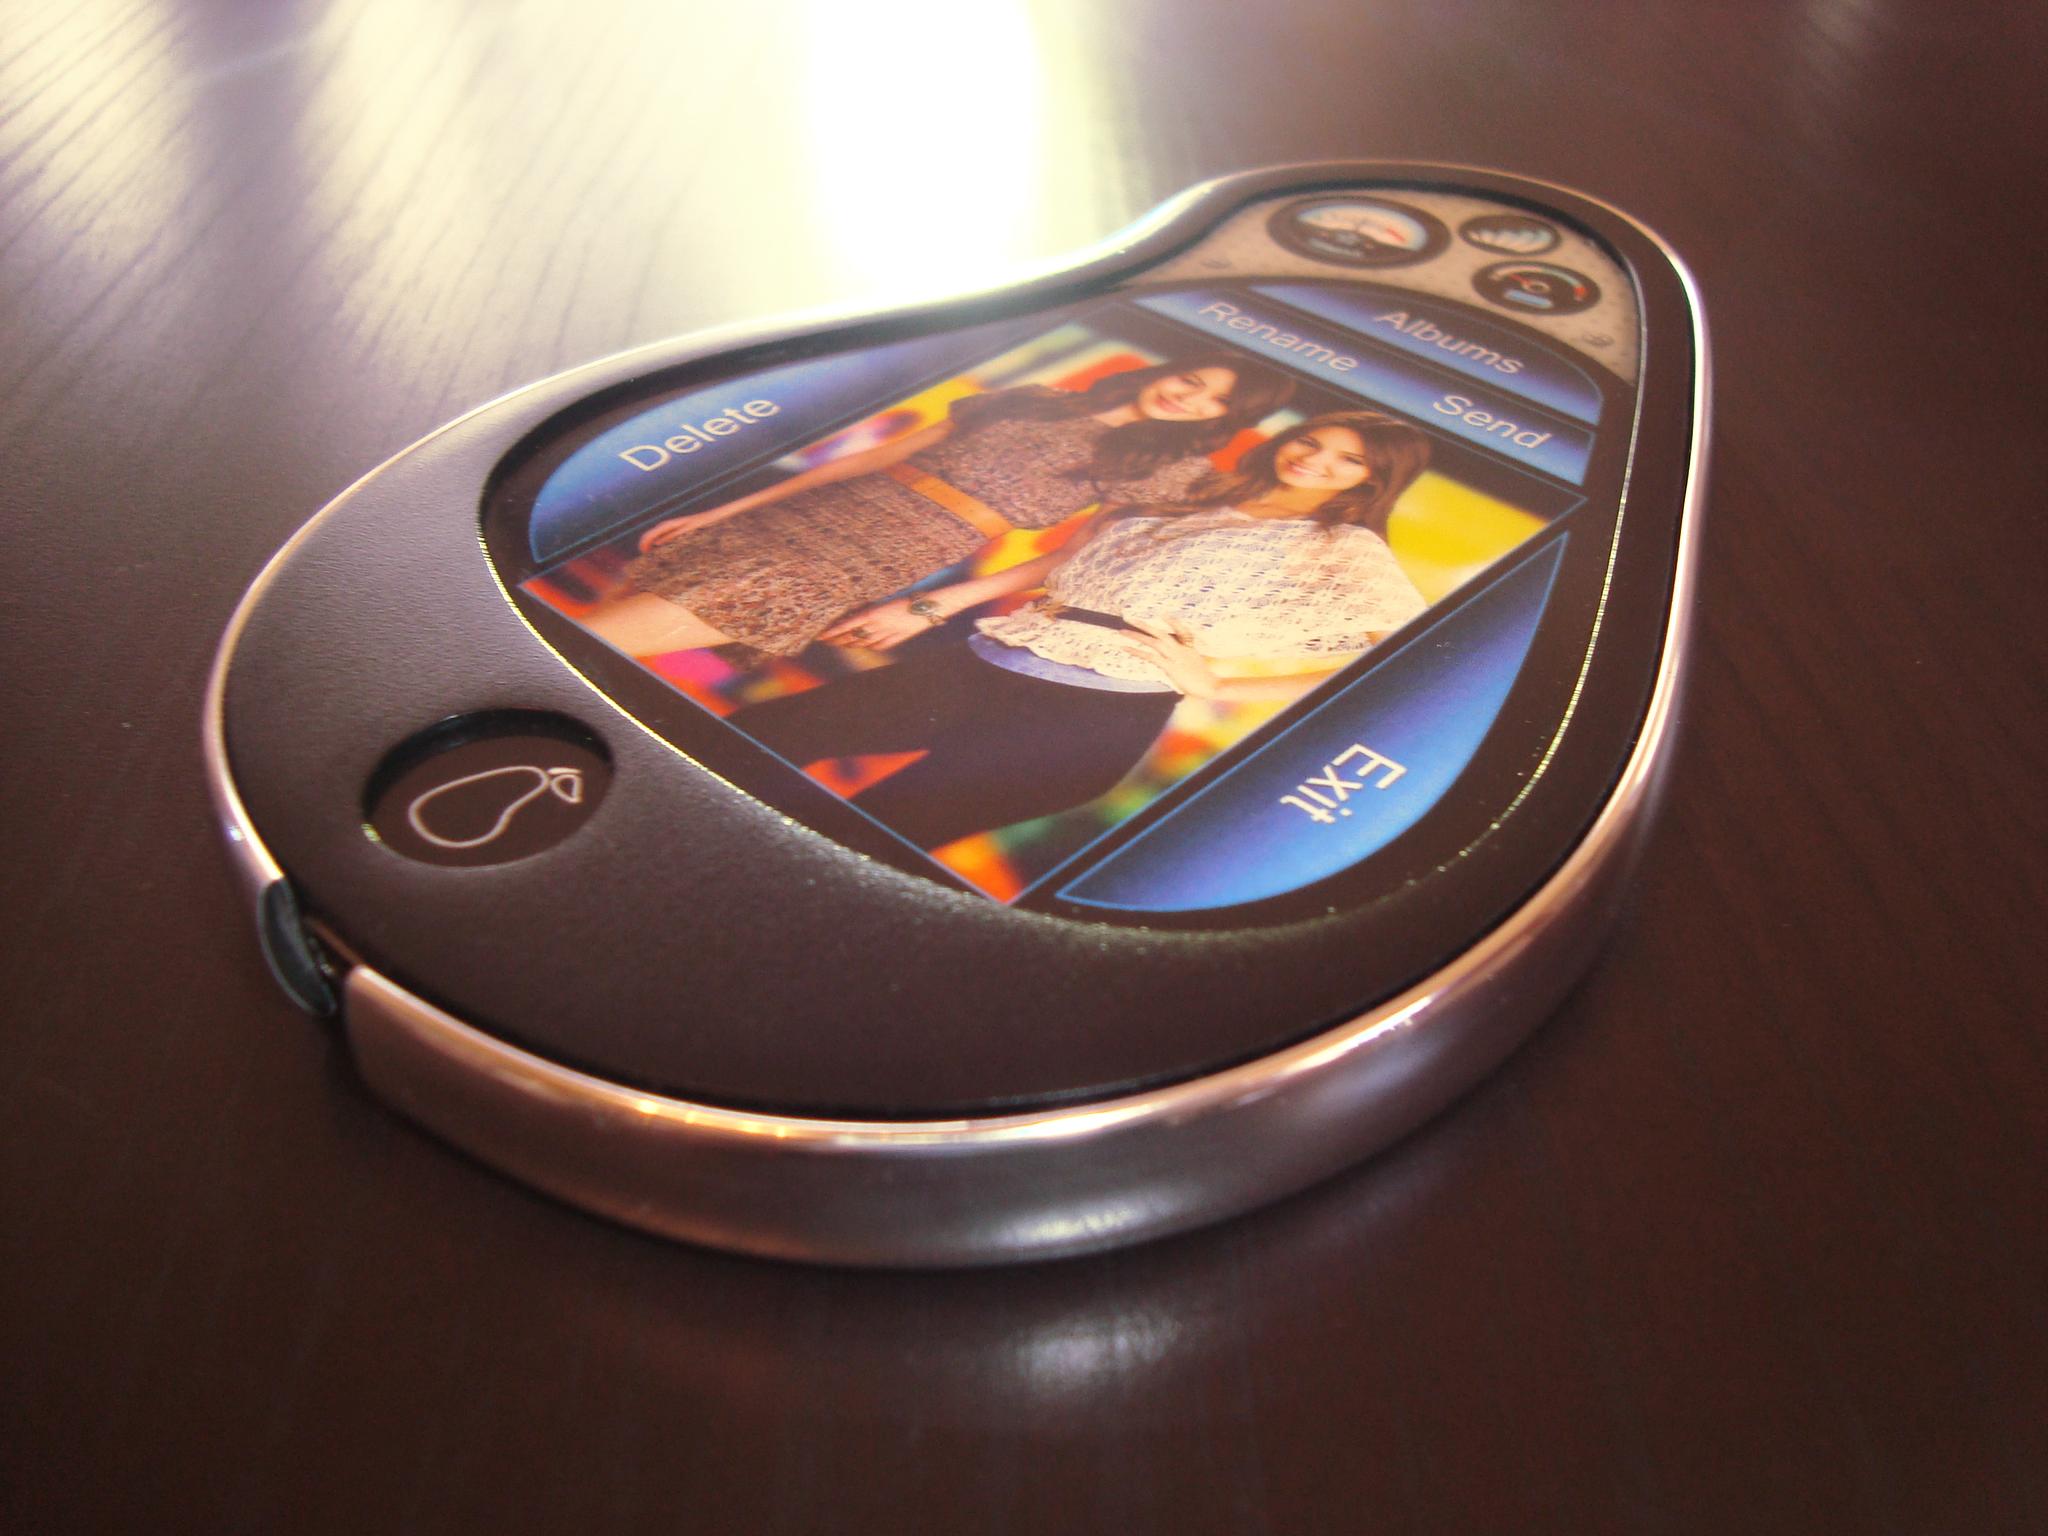 Super pearphone | Explore pearphone on DeviantArt CQ14